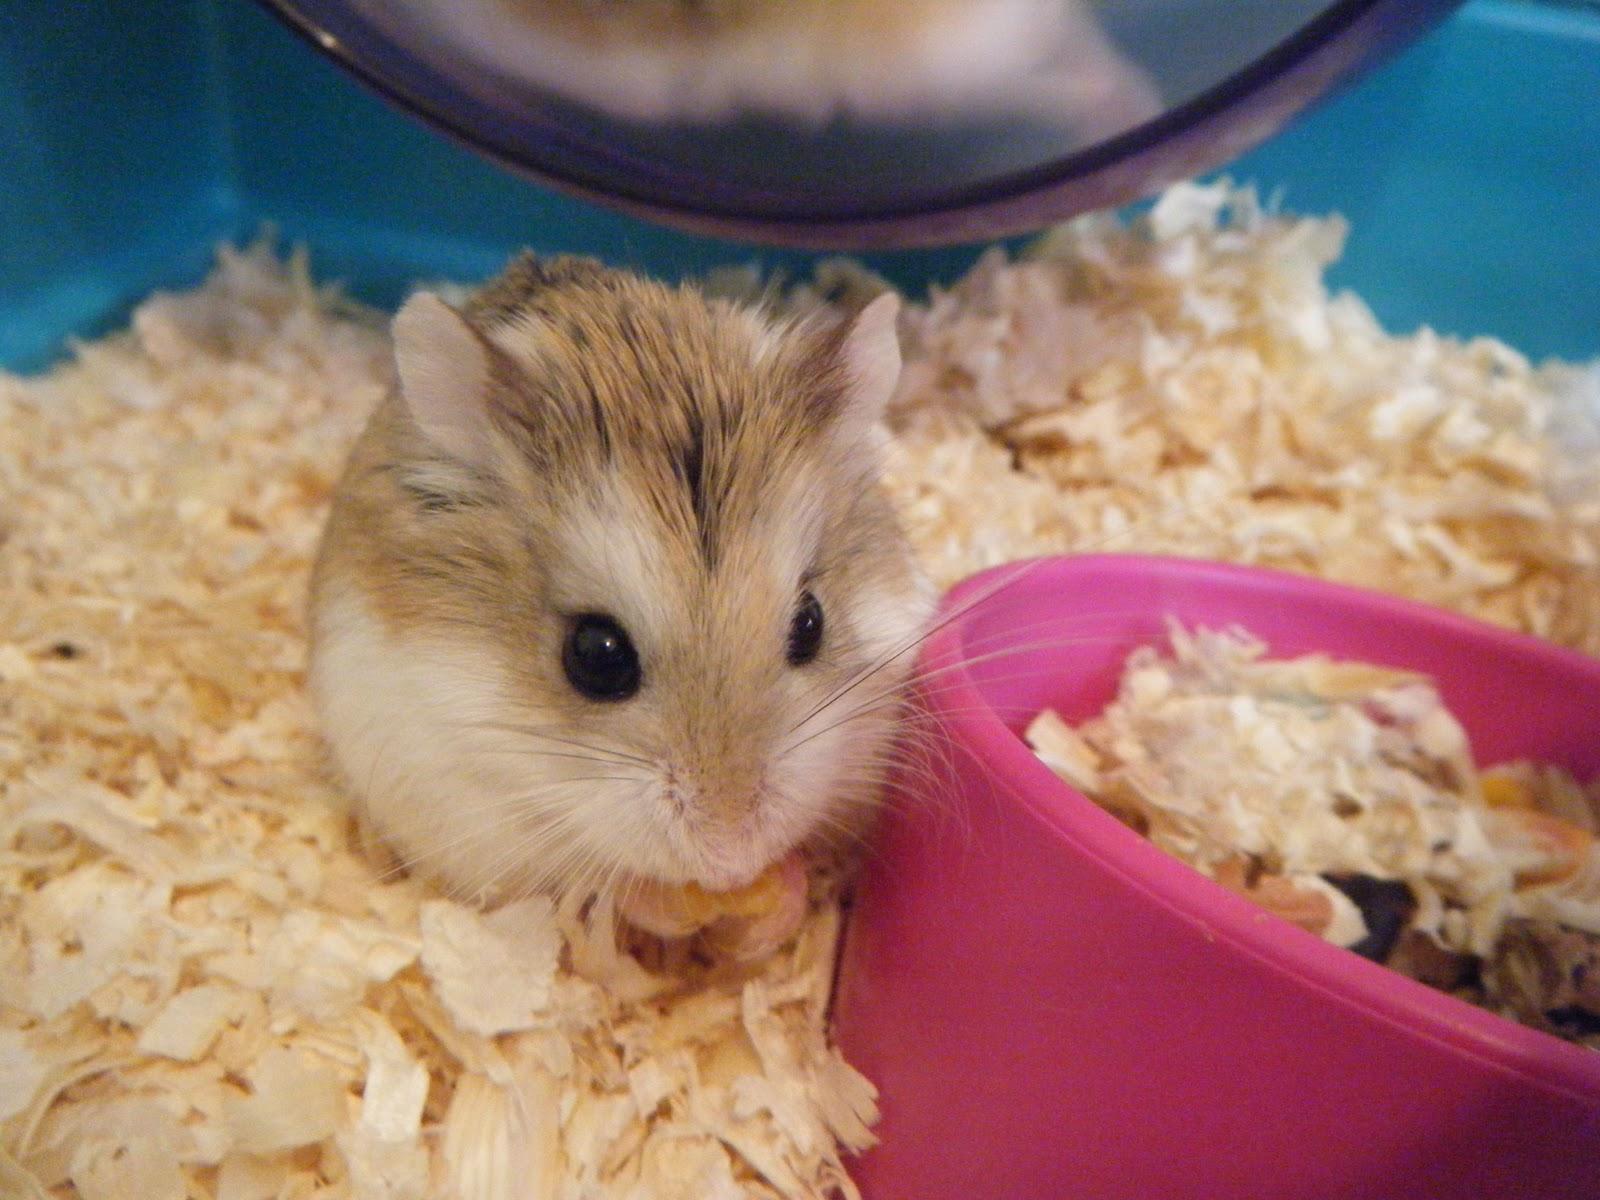 Cute Roborovski Hamster Wallpaper.jpg